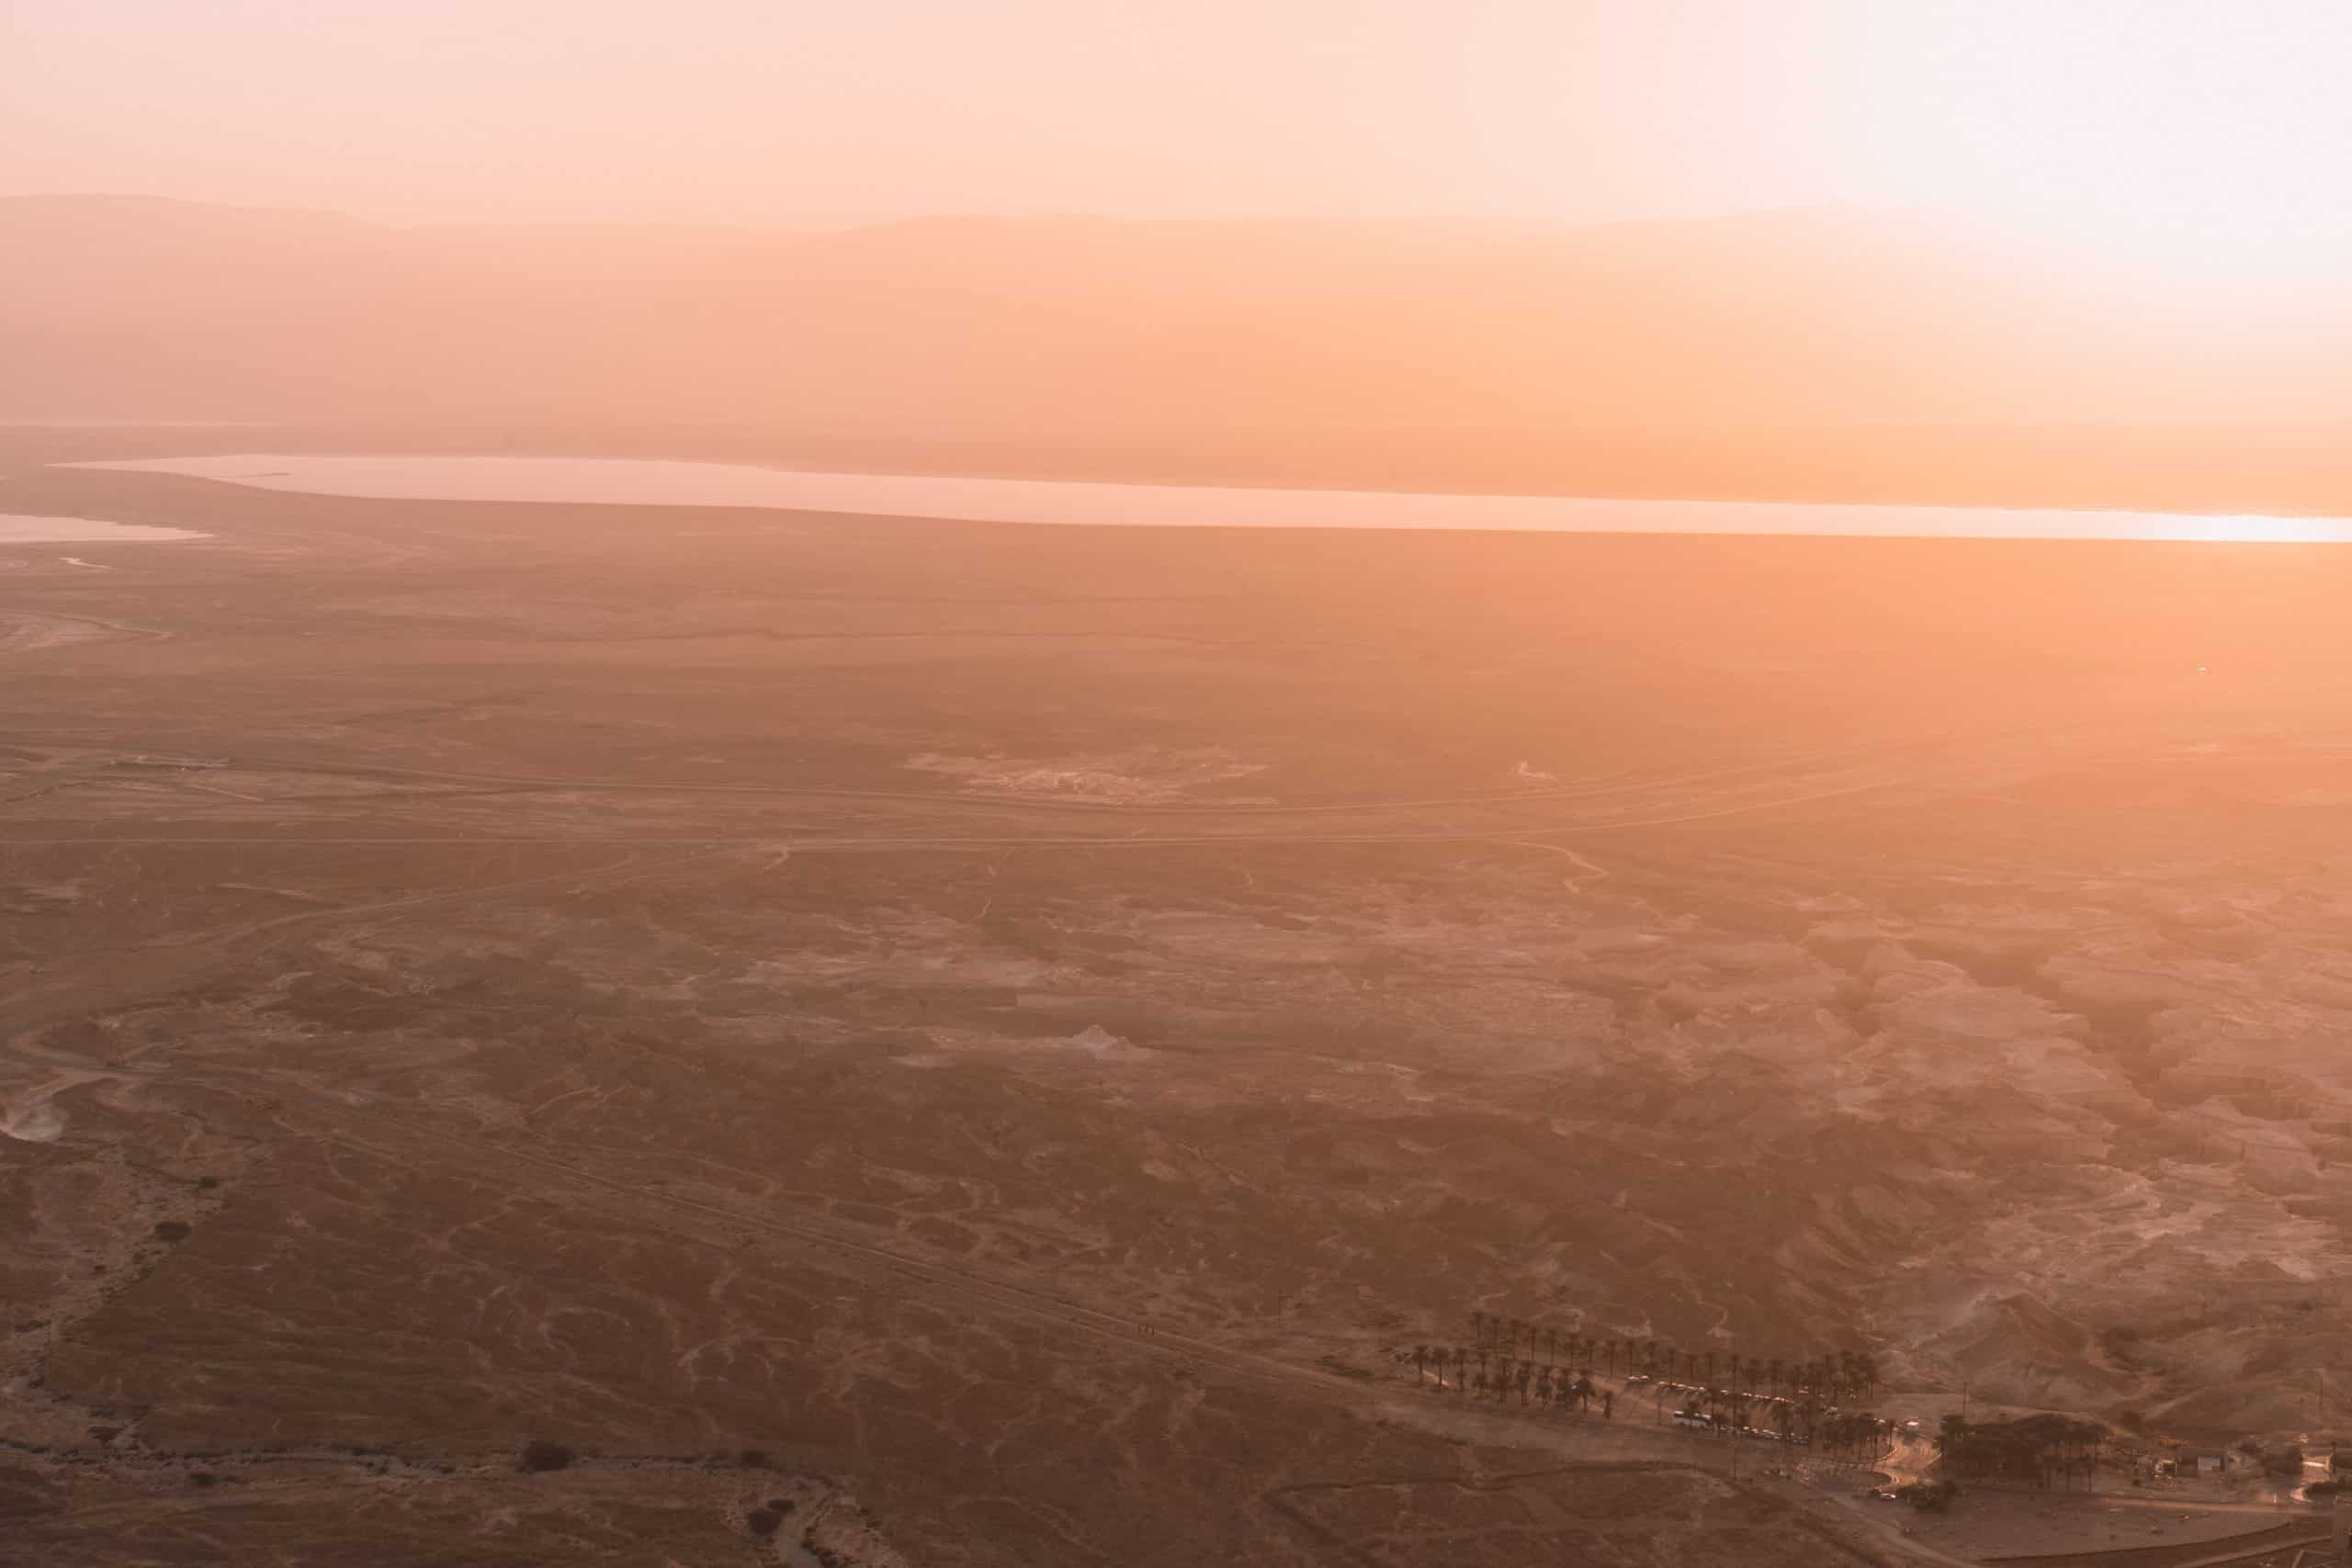 wschód słońca masada izrael